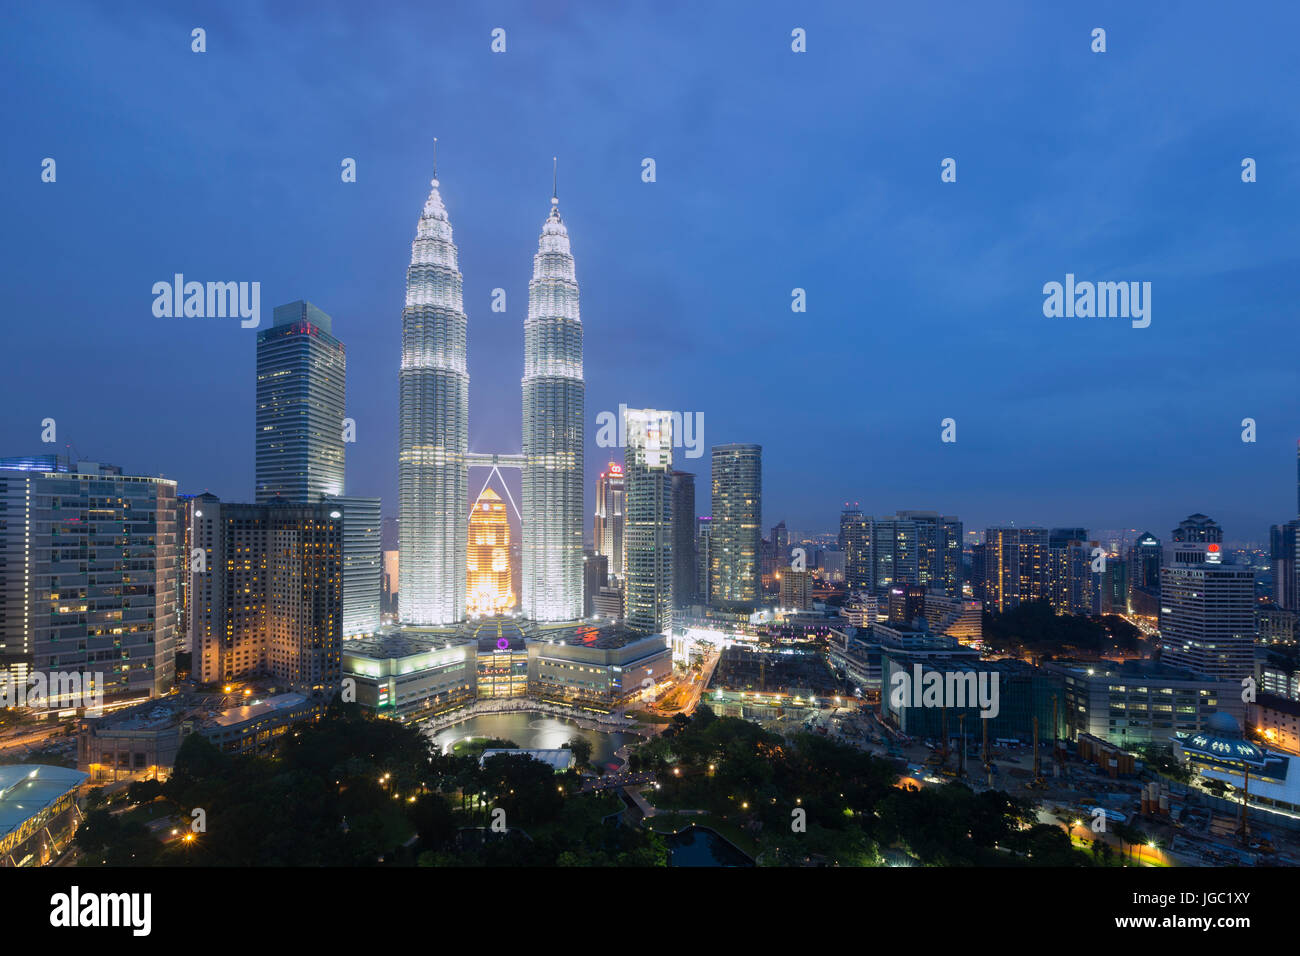 Petronas twin towers at dusk, Kuala Lumpur, Malaysia - Stock Image